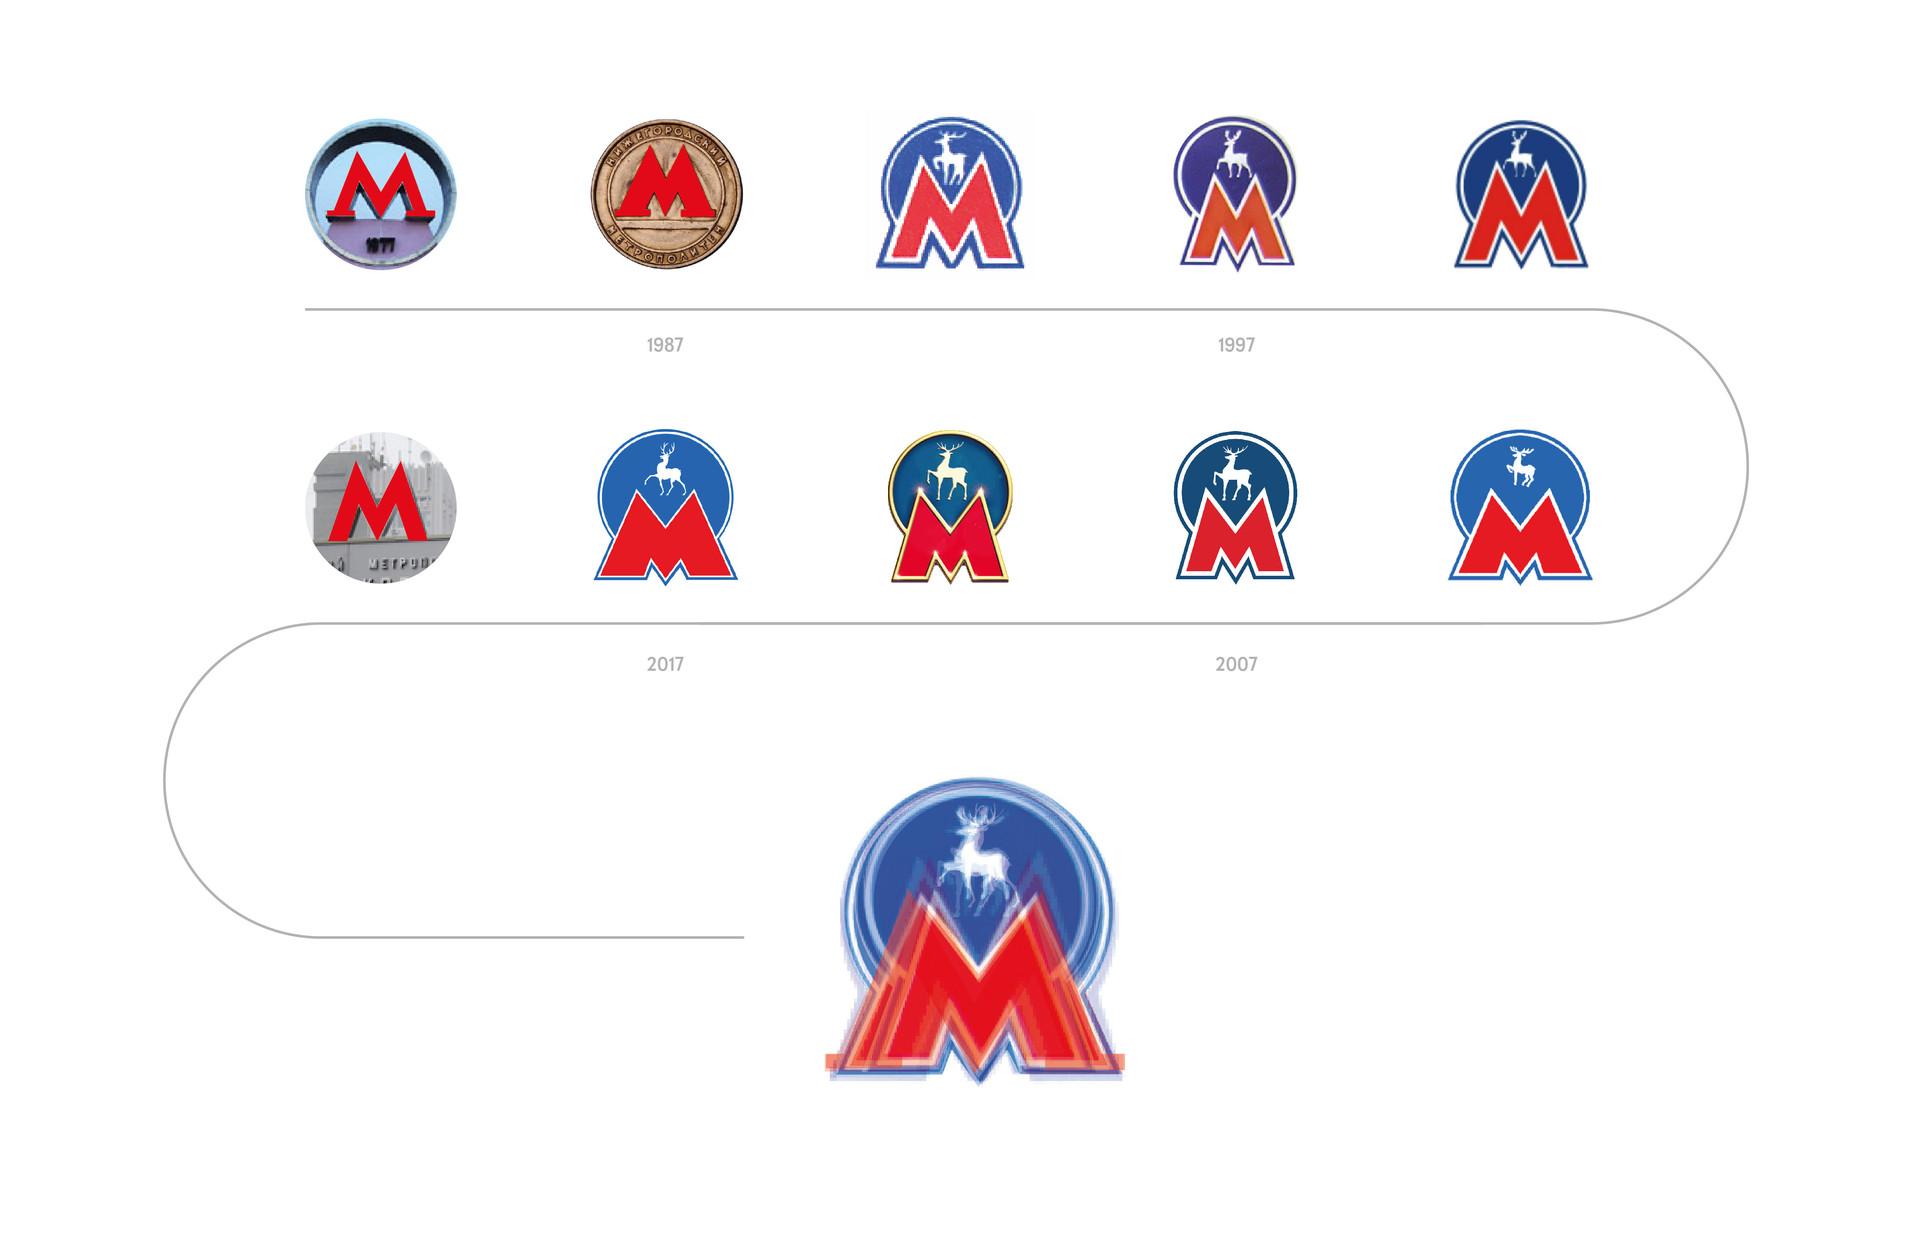 Анализ старых версий логотипа и литеры М (1985-2016)